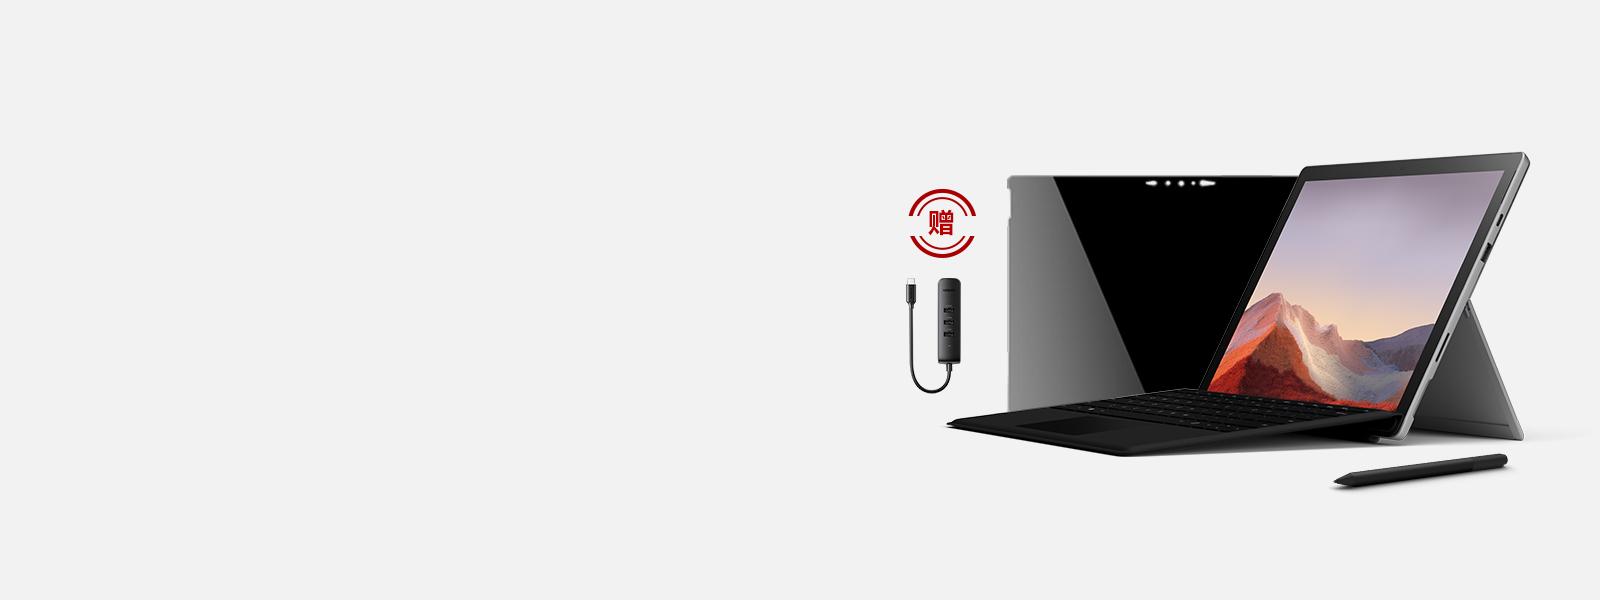 Surface Pro 7 全能套餐